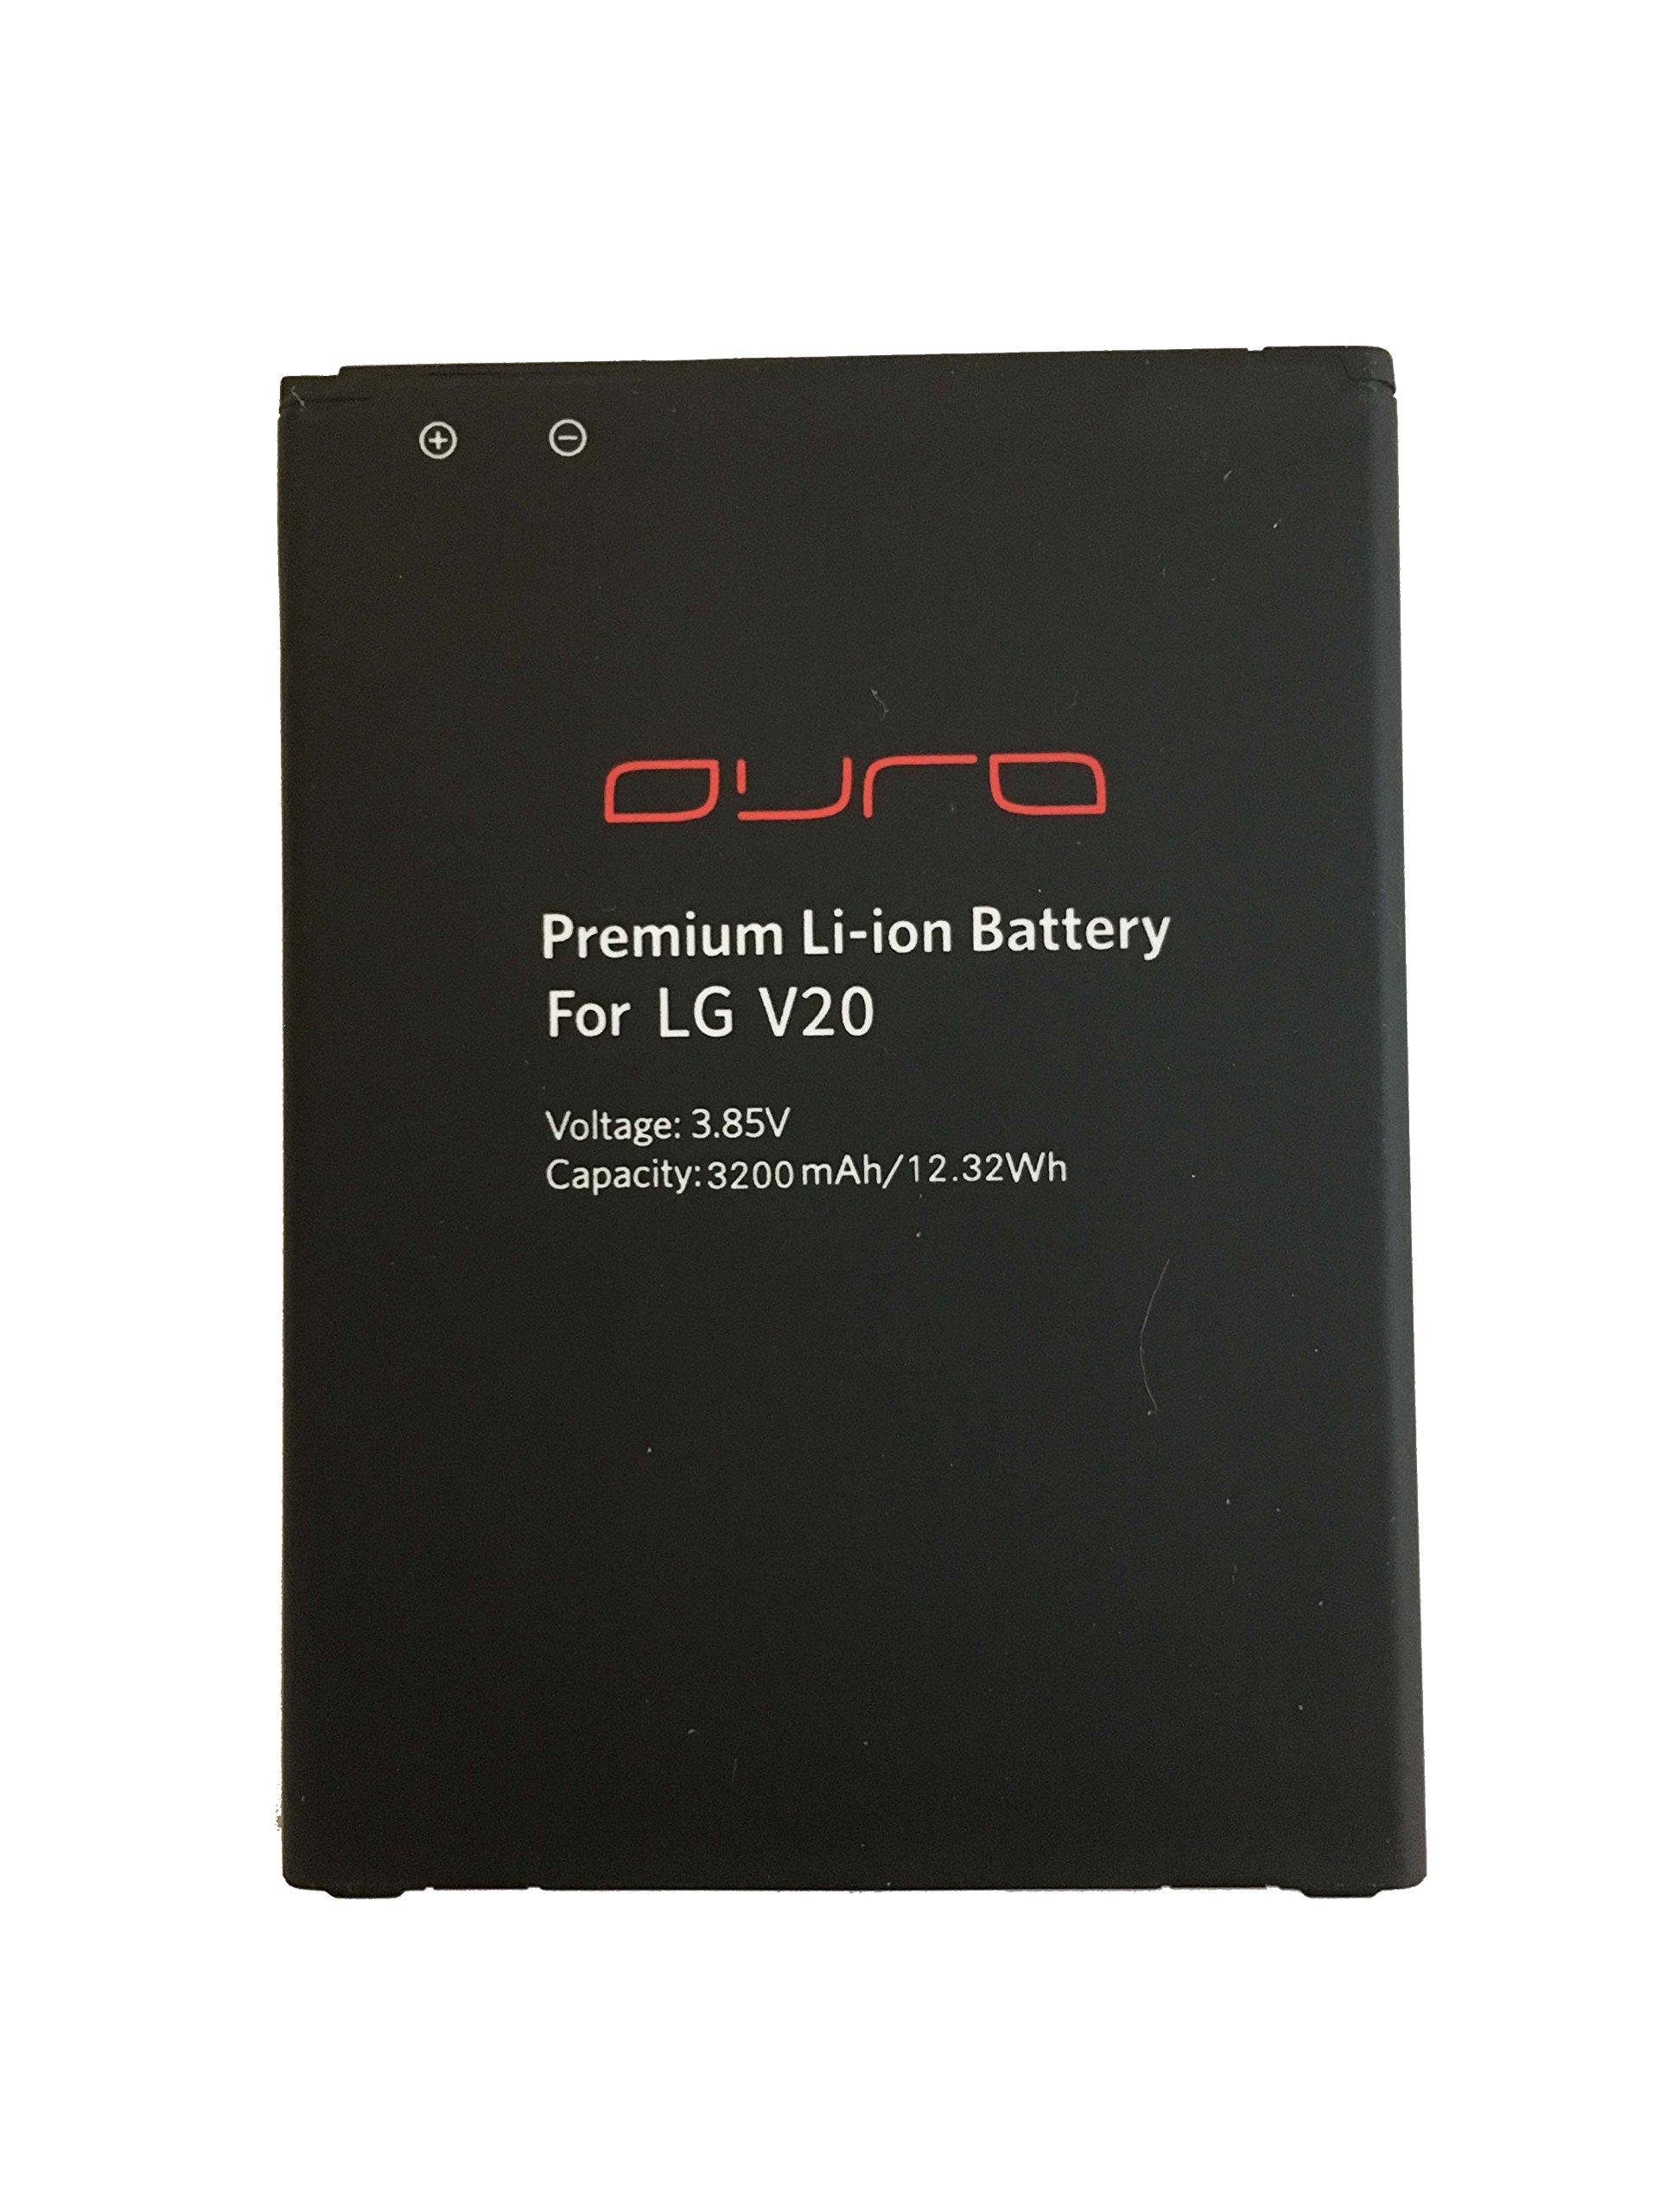 Bateria Celular LG V20 Premium Li ion by DURA Innovation